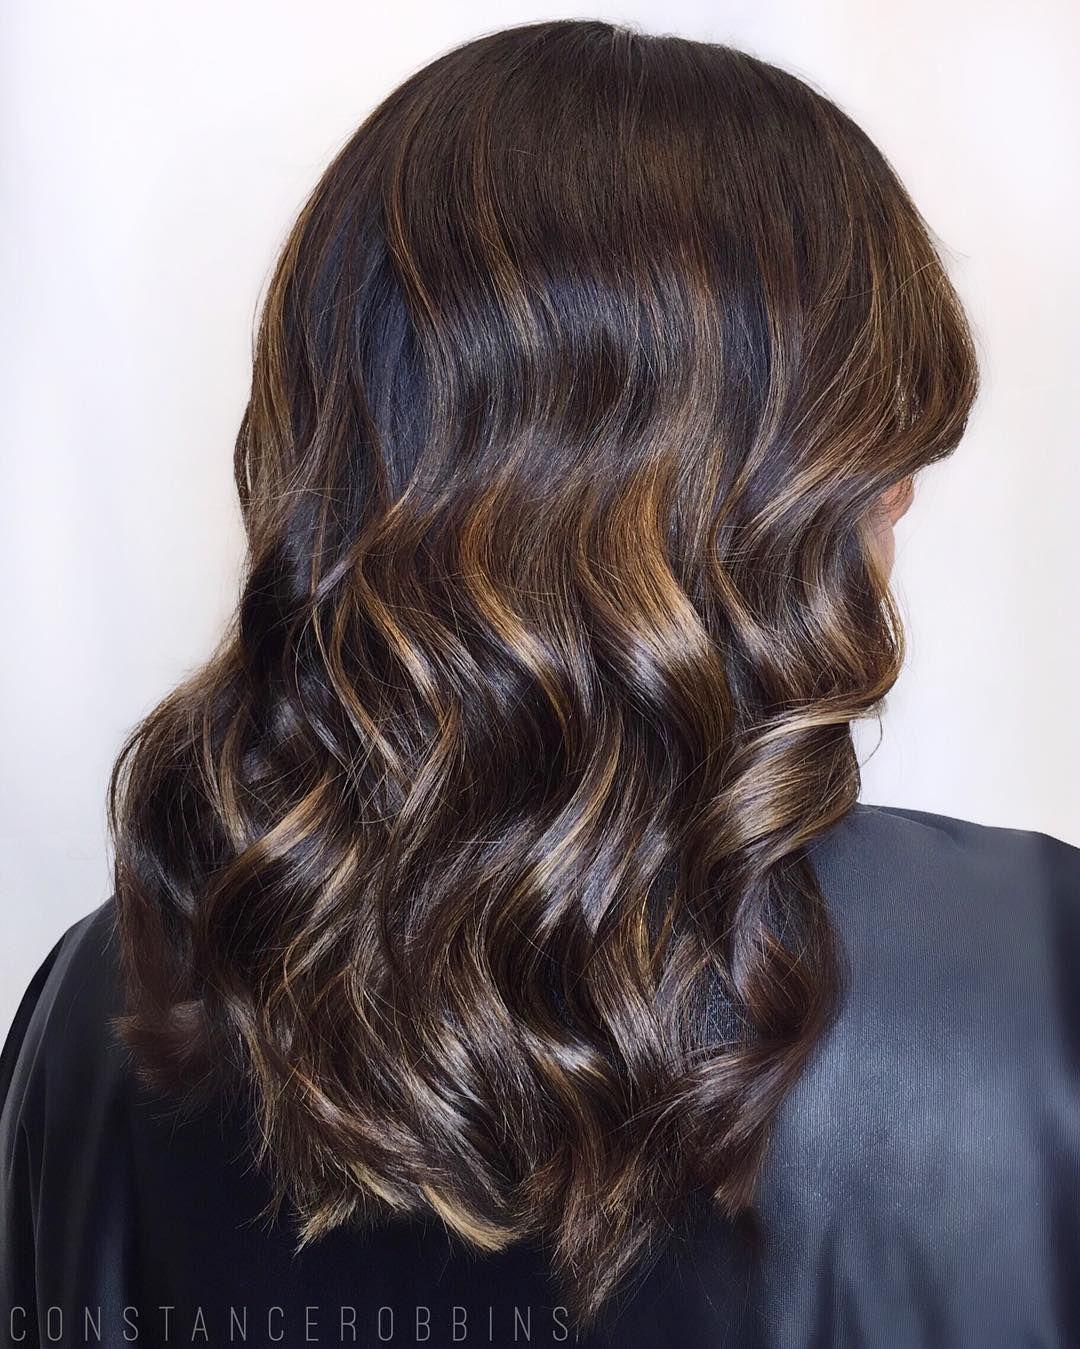 Black Hair With Golden Brown Highlights Black Hair With Highlights Golden Brown Hair Coffee Brown Hair